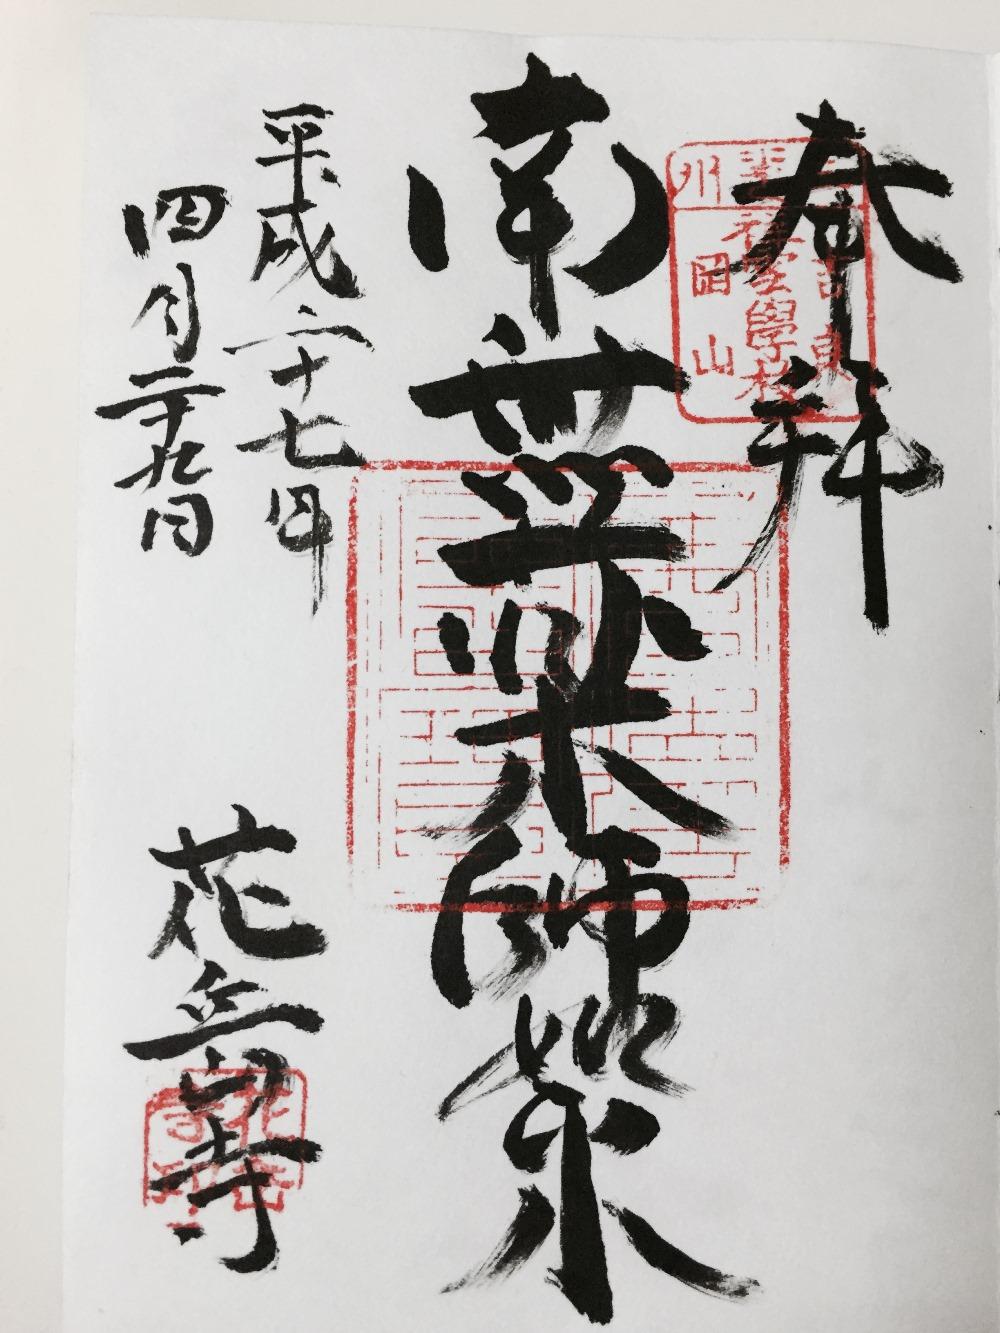 花岳寺 西尾ご朱印